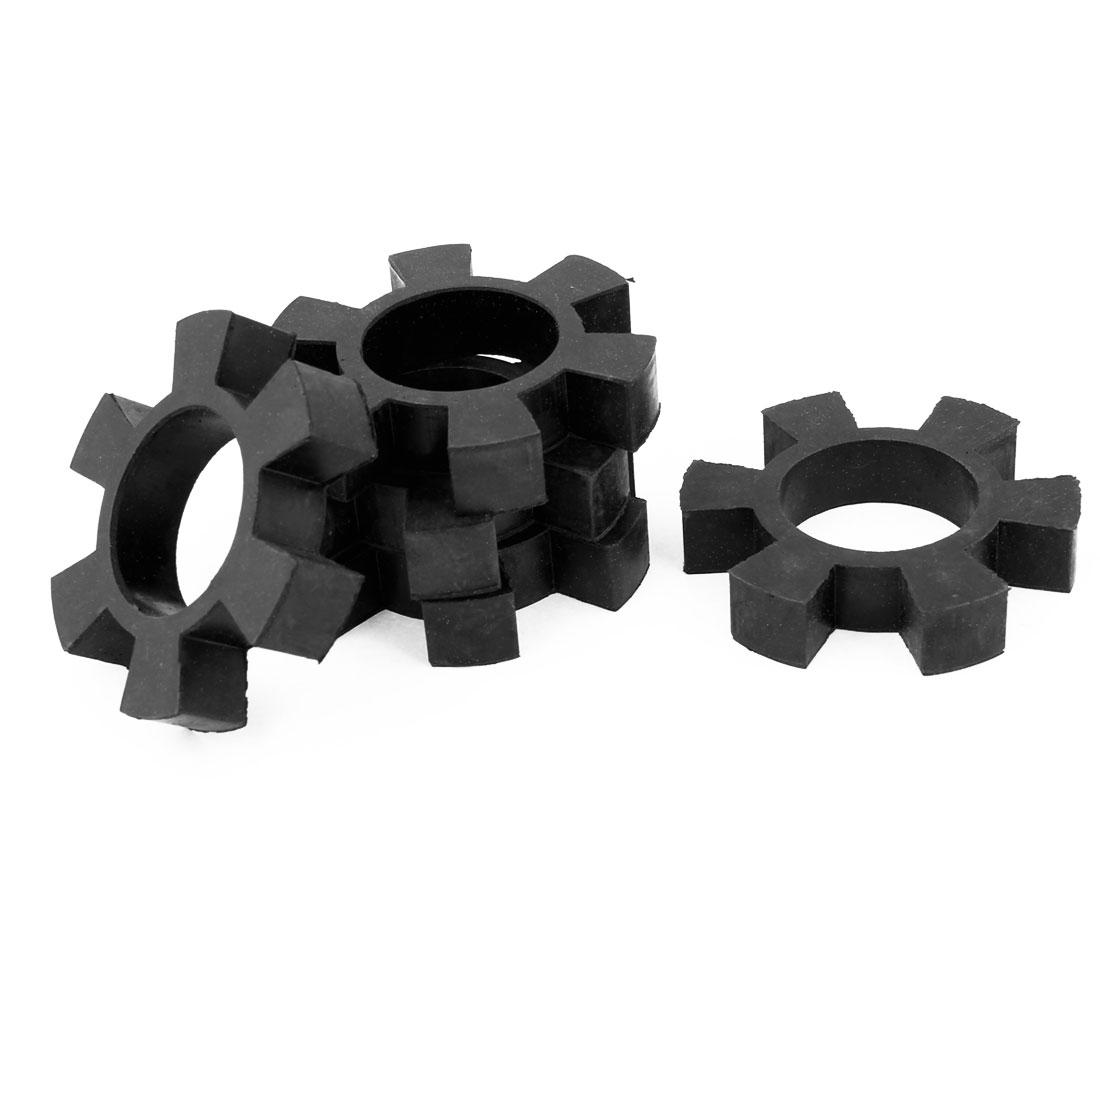 "5 Pcs 3.2"" OD Drive Shaft Coupling Damper Insert Spider Cushion Black"